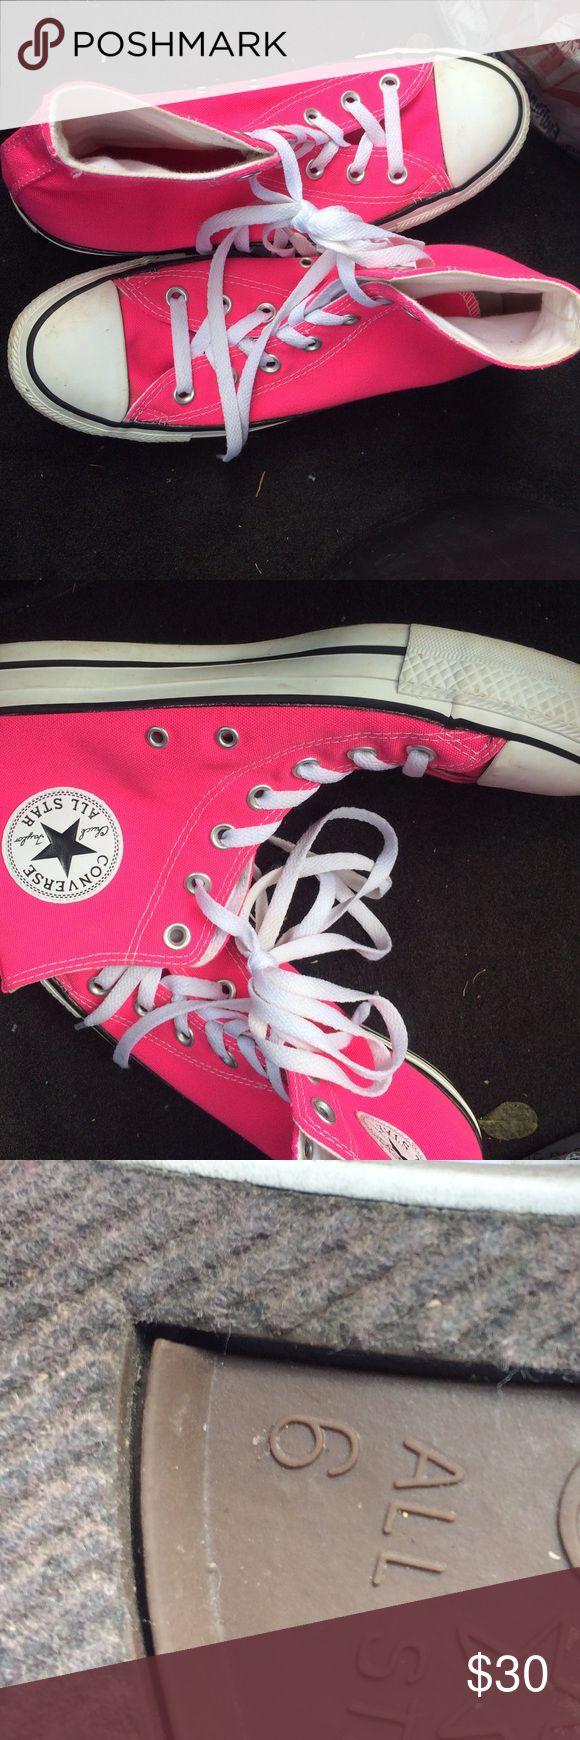 Men's Converse All pink for men size 6 worn but decent condition Converse Shoes Athletic Shoes